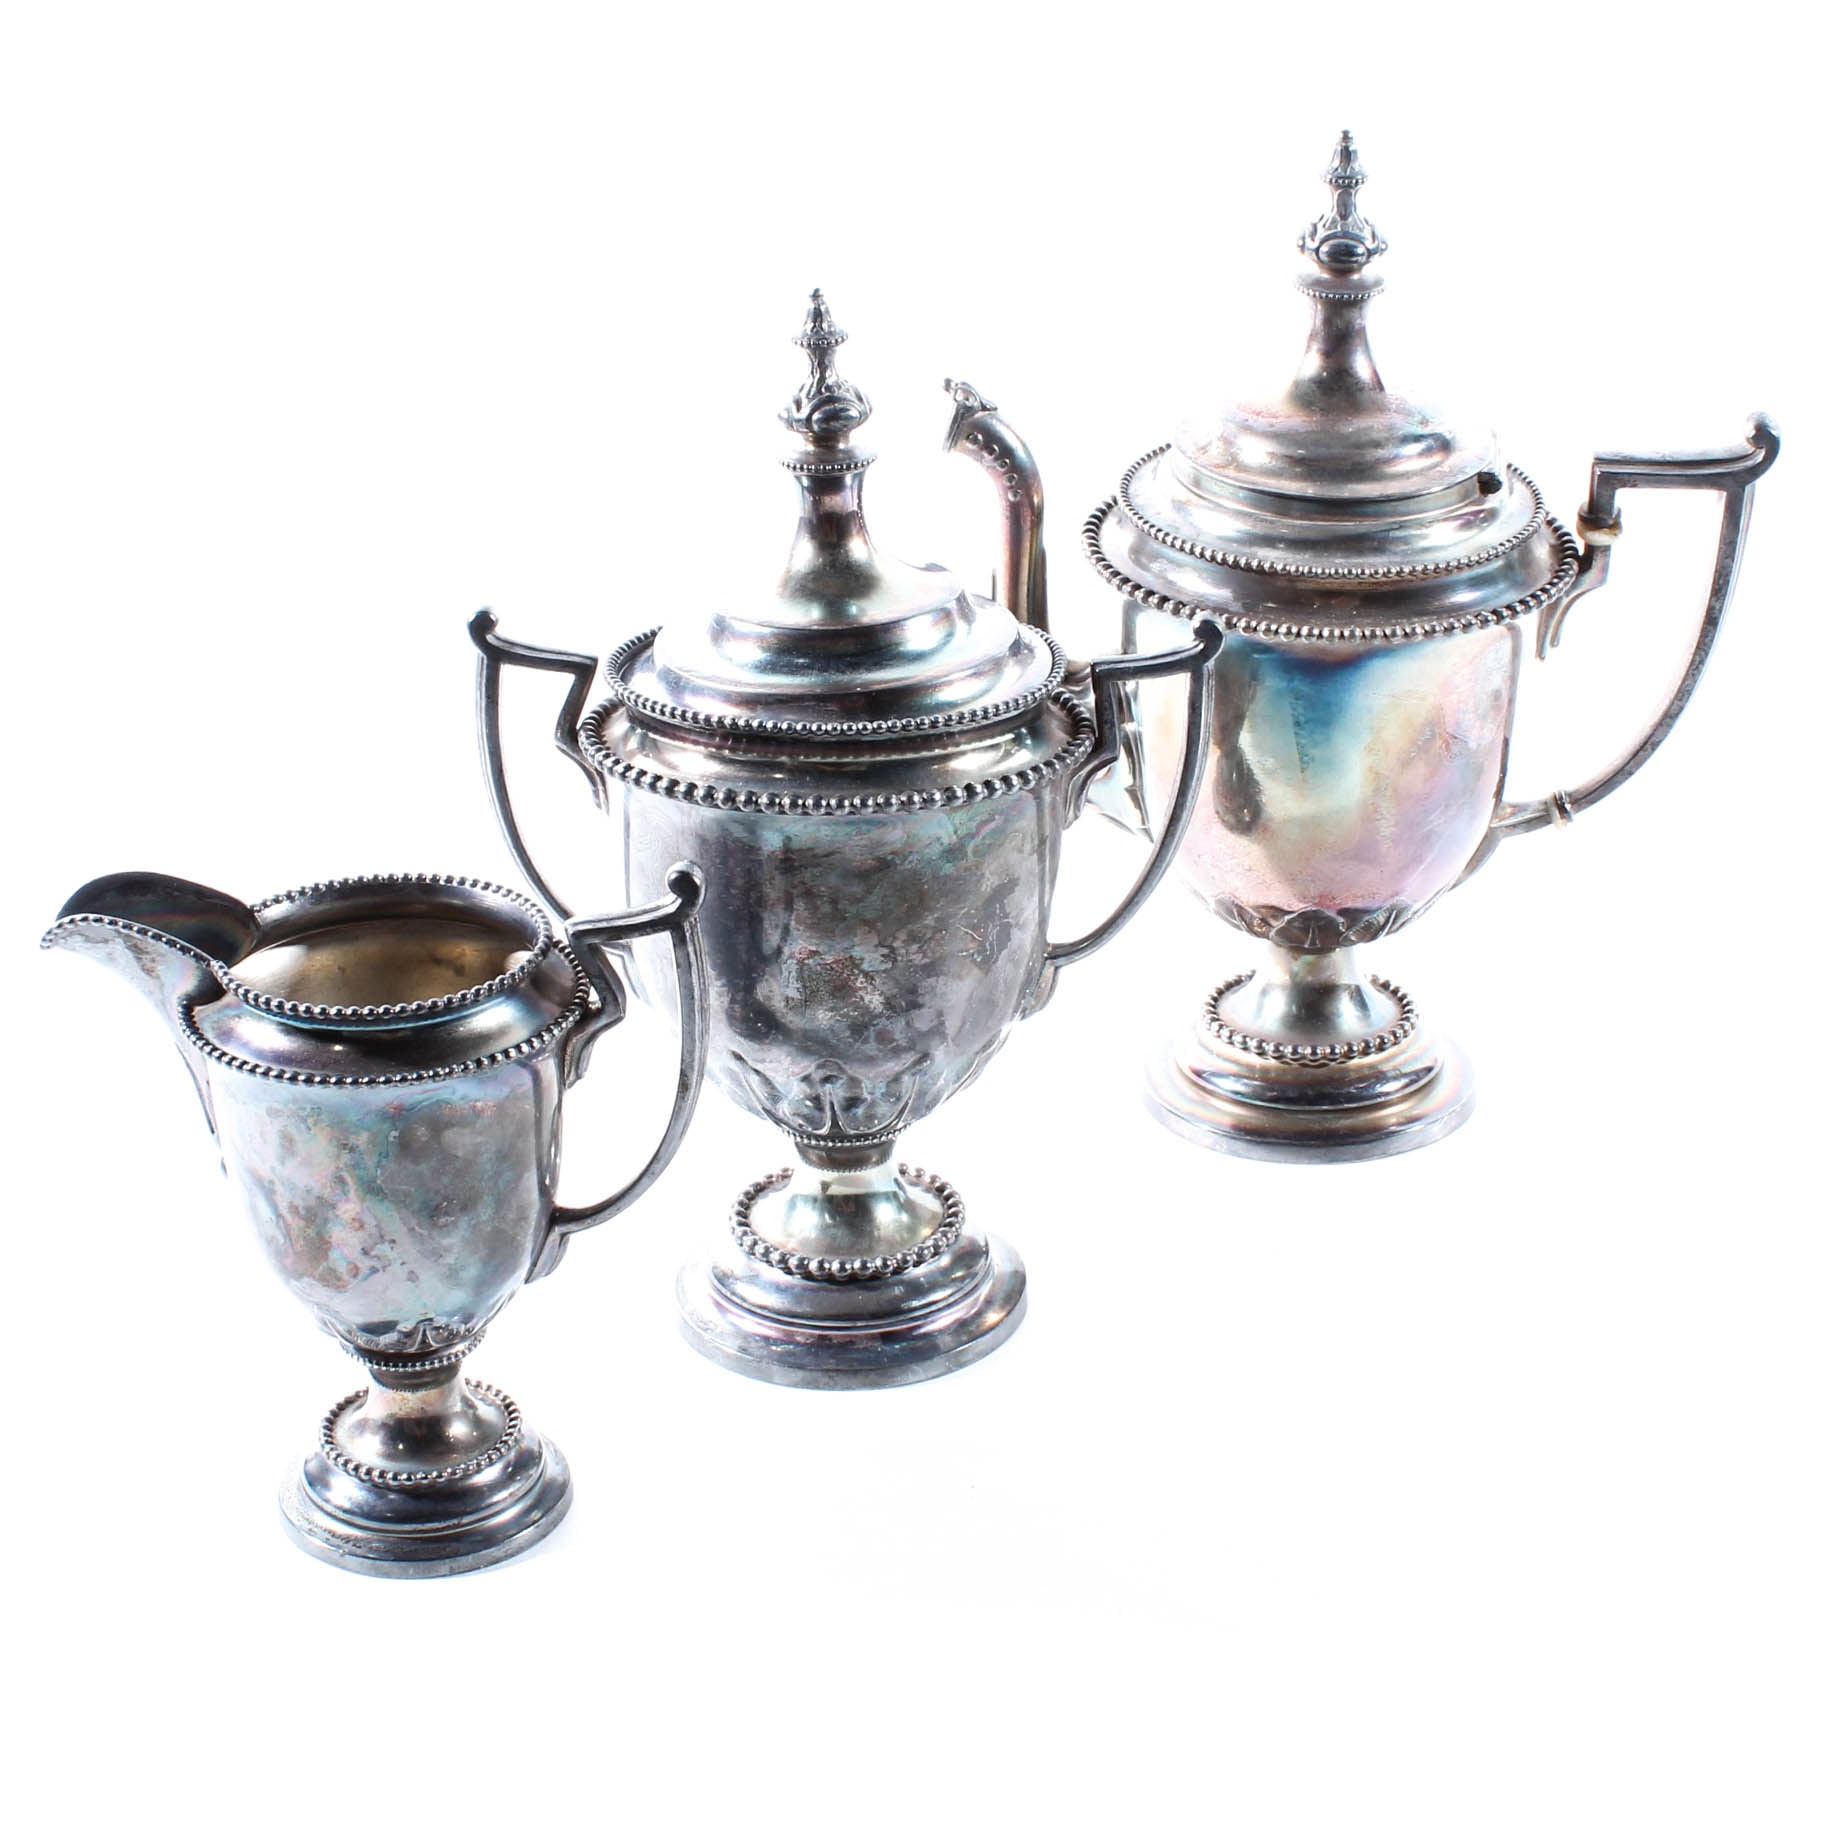 Reed & Barton Silver Plate Tea Service